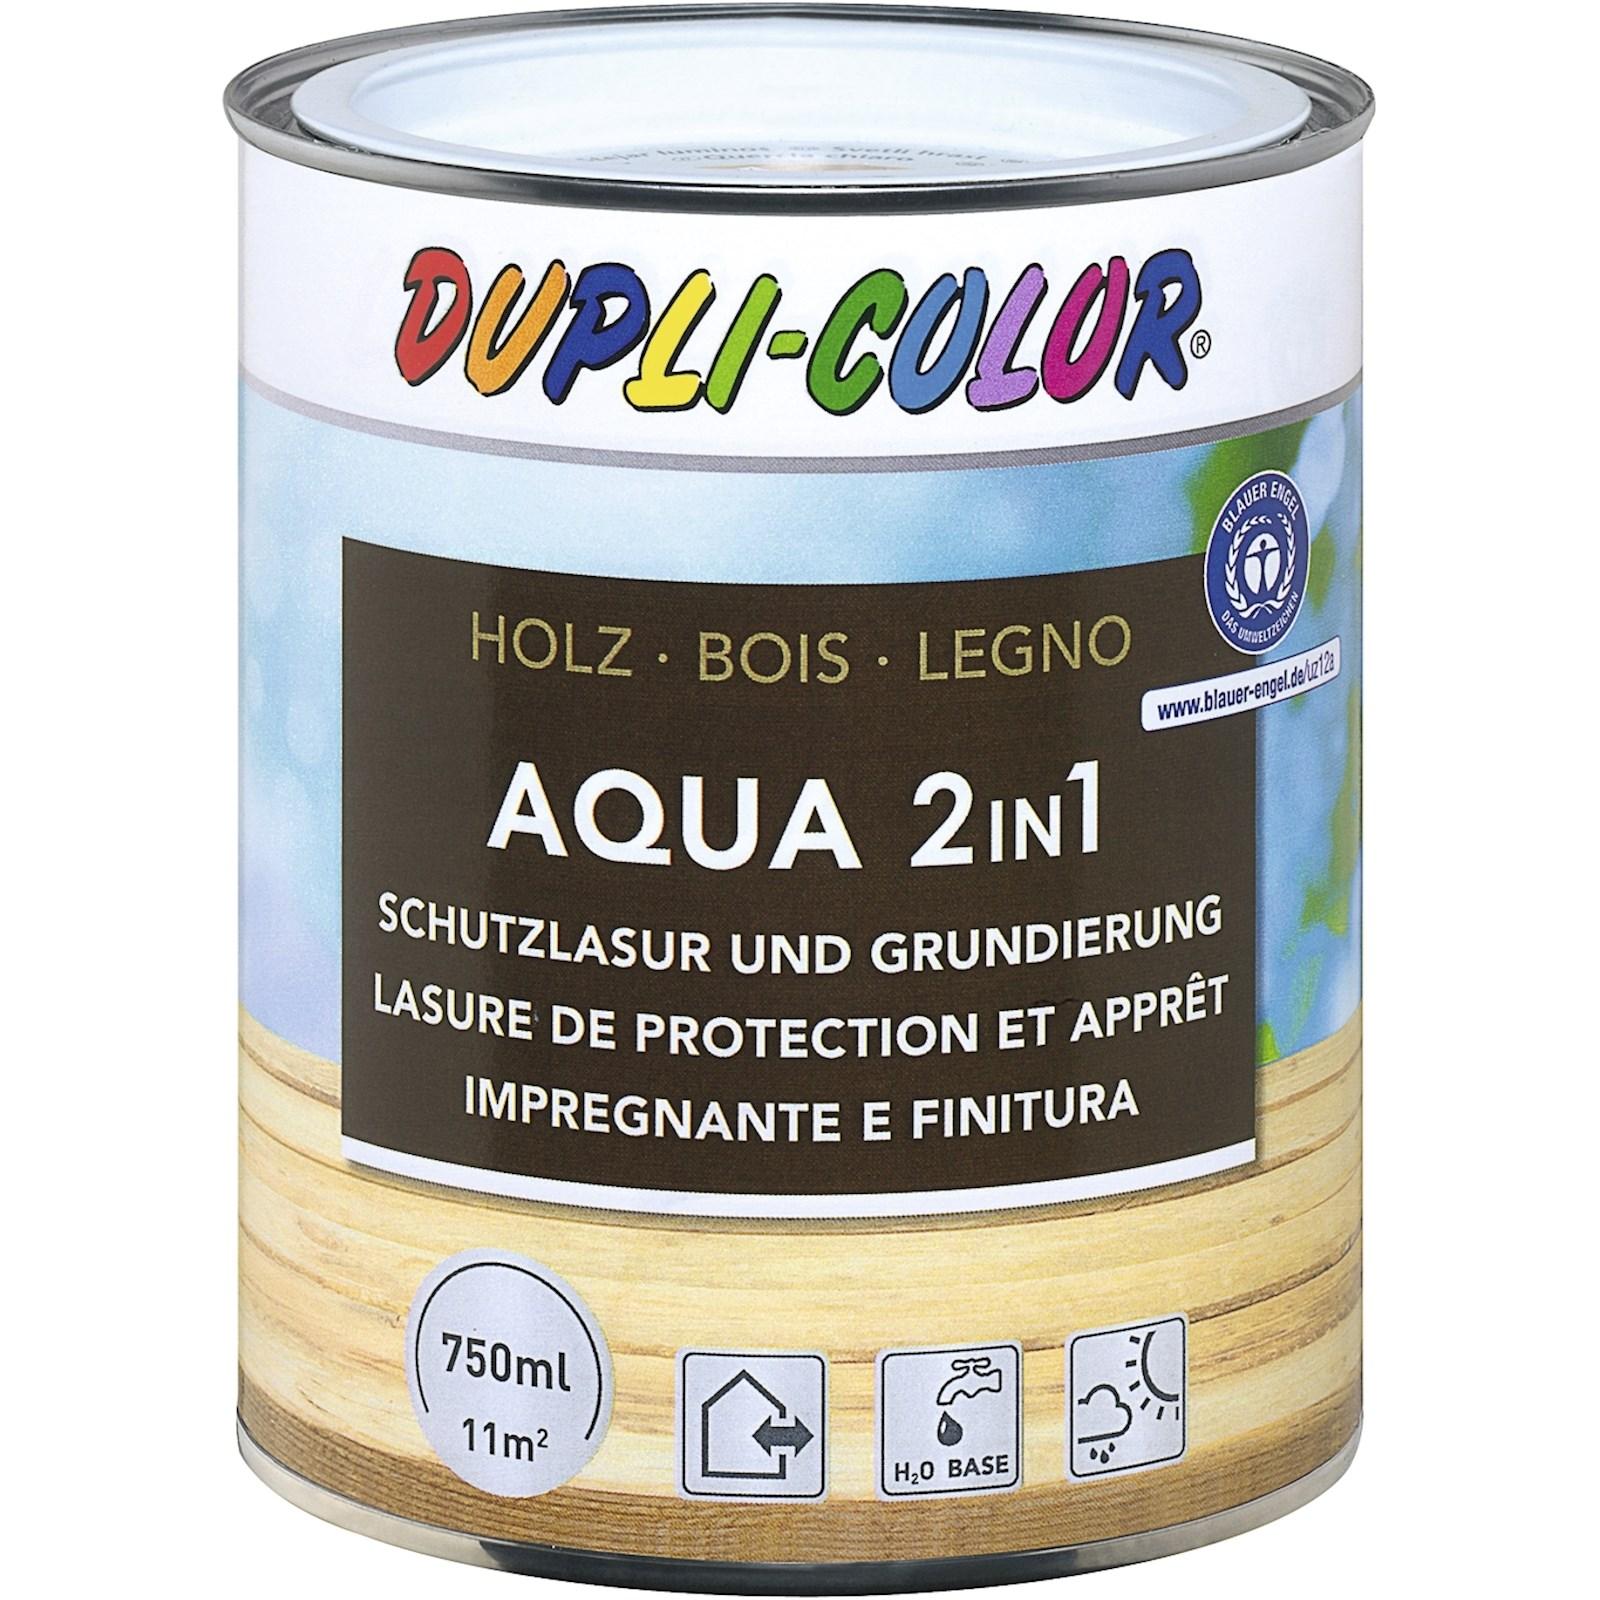 holzlasur aqua weiss 750 ml holzschutz landi. Black Bedroom Furniture Sets. Home Design Ideas